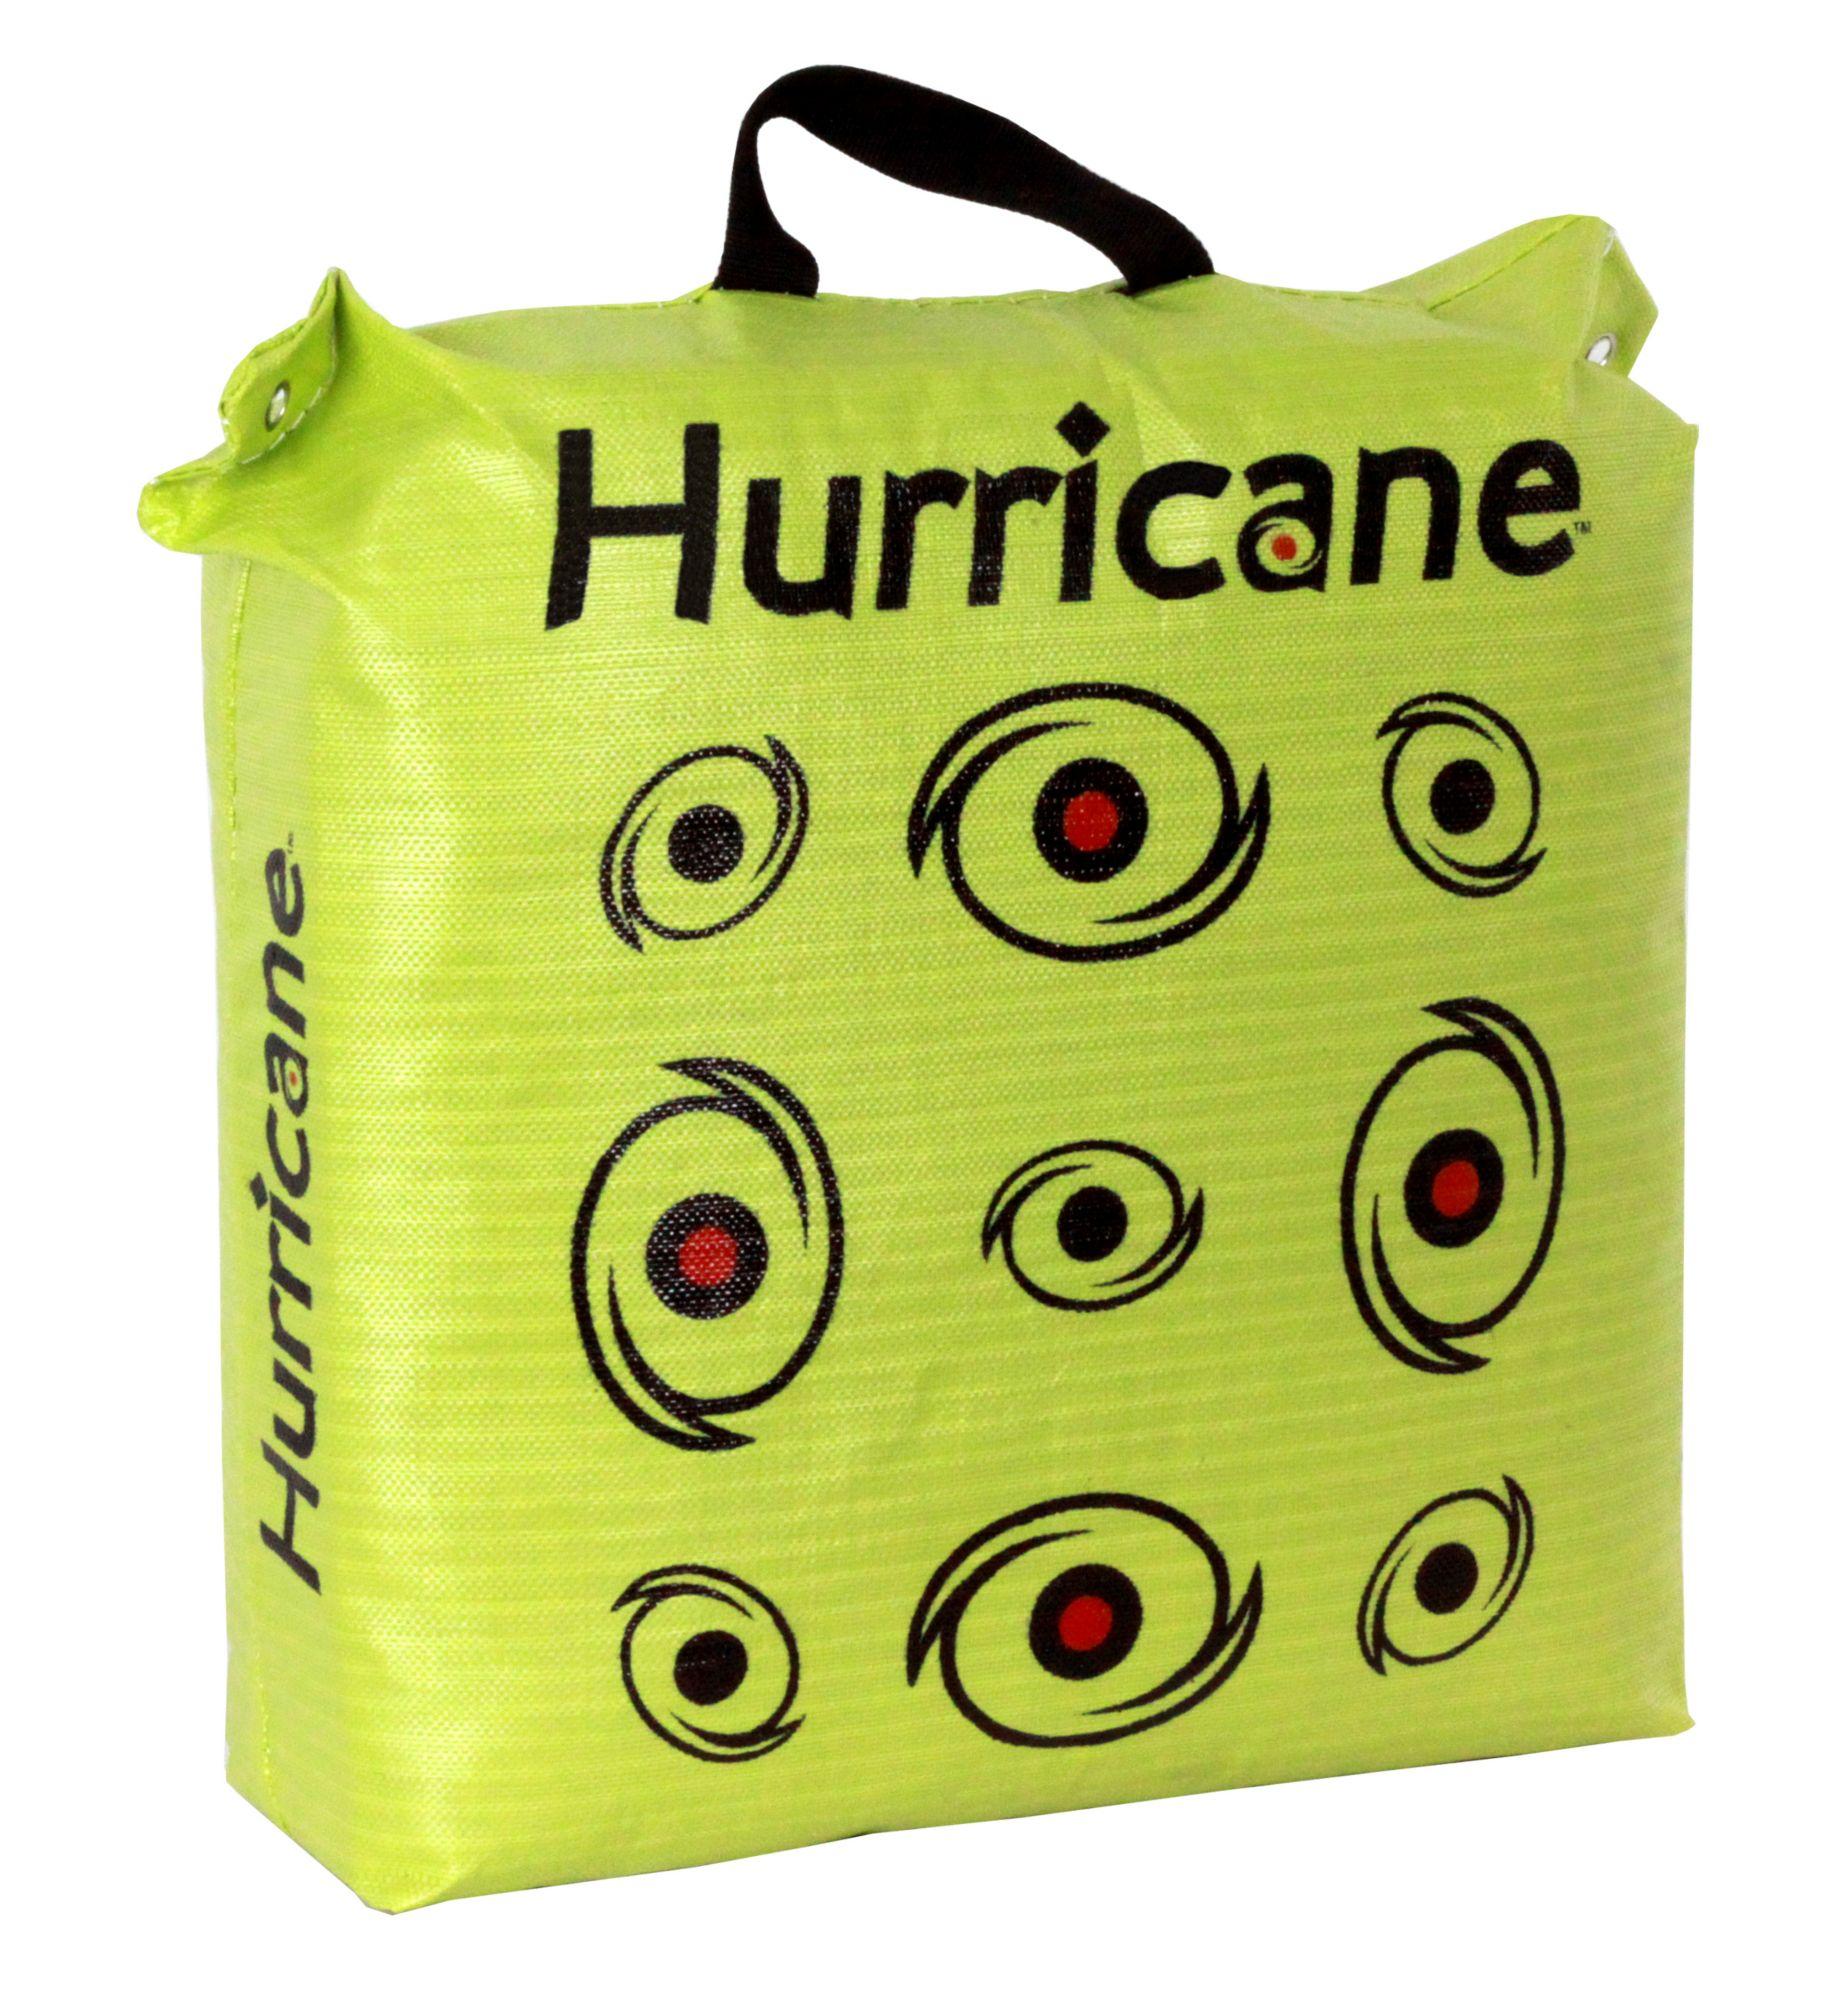 Hurricane H20 Bag Archery Target, green thumbnail